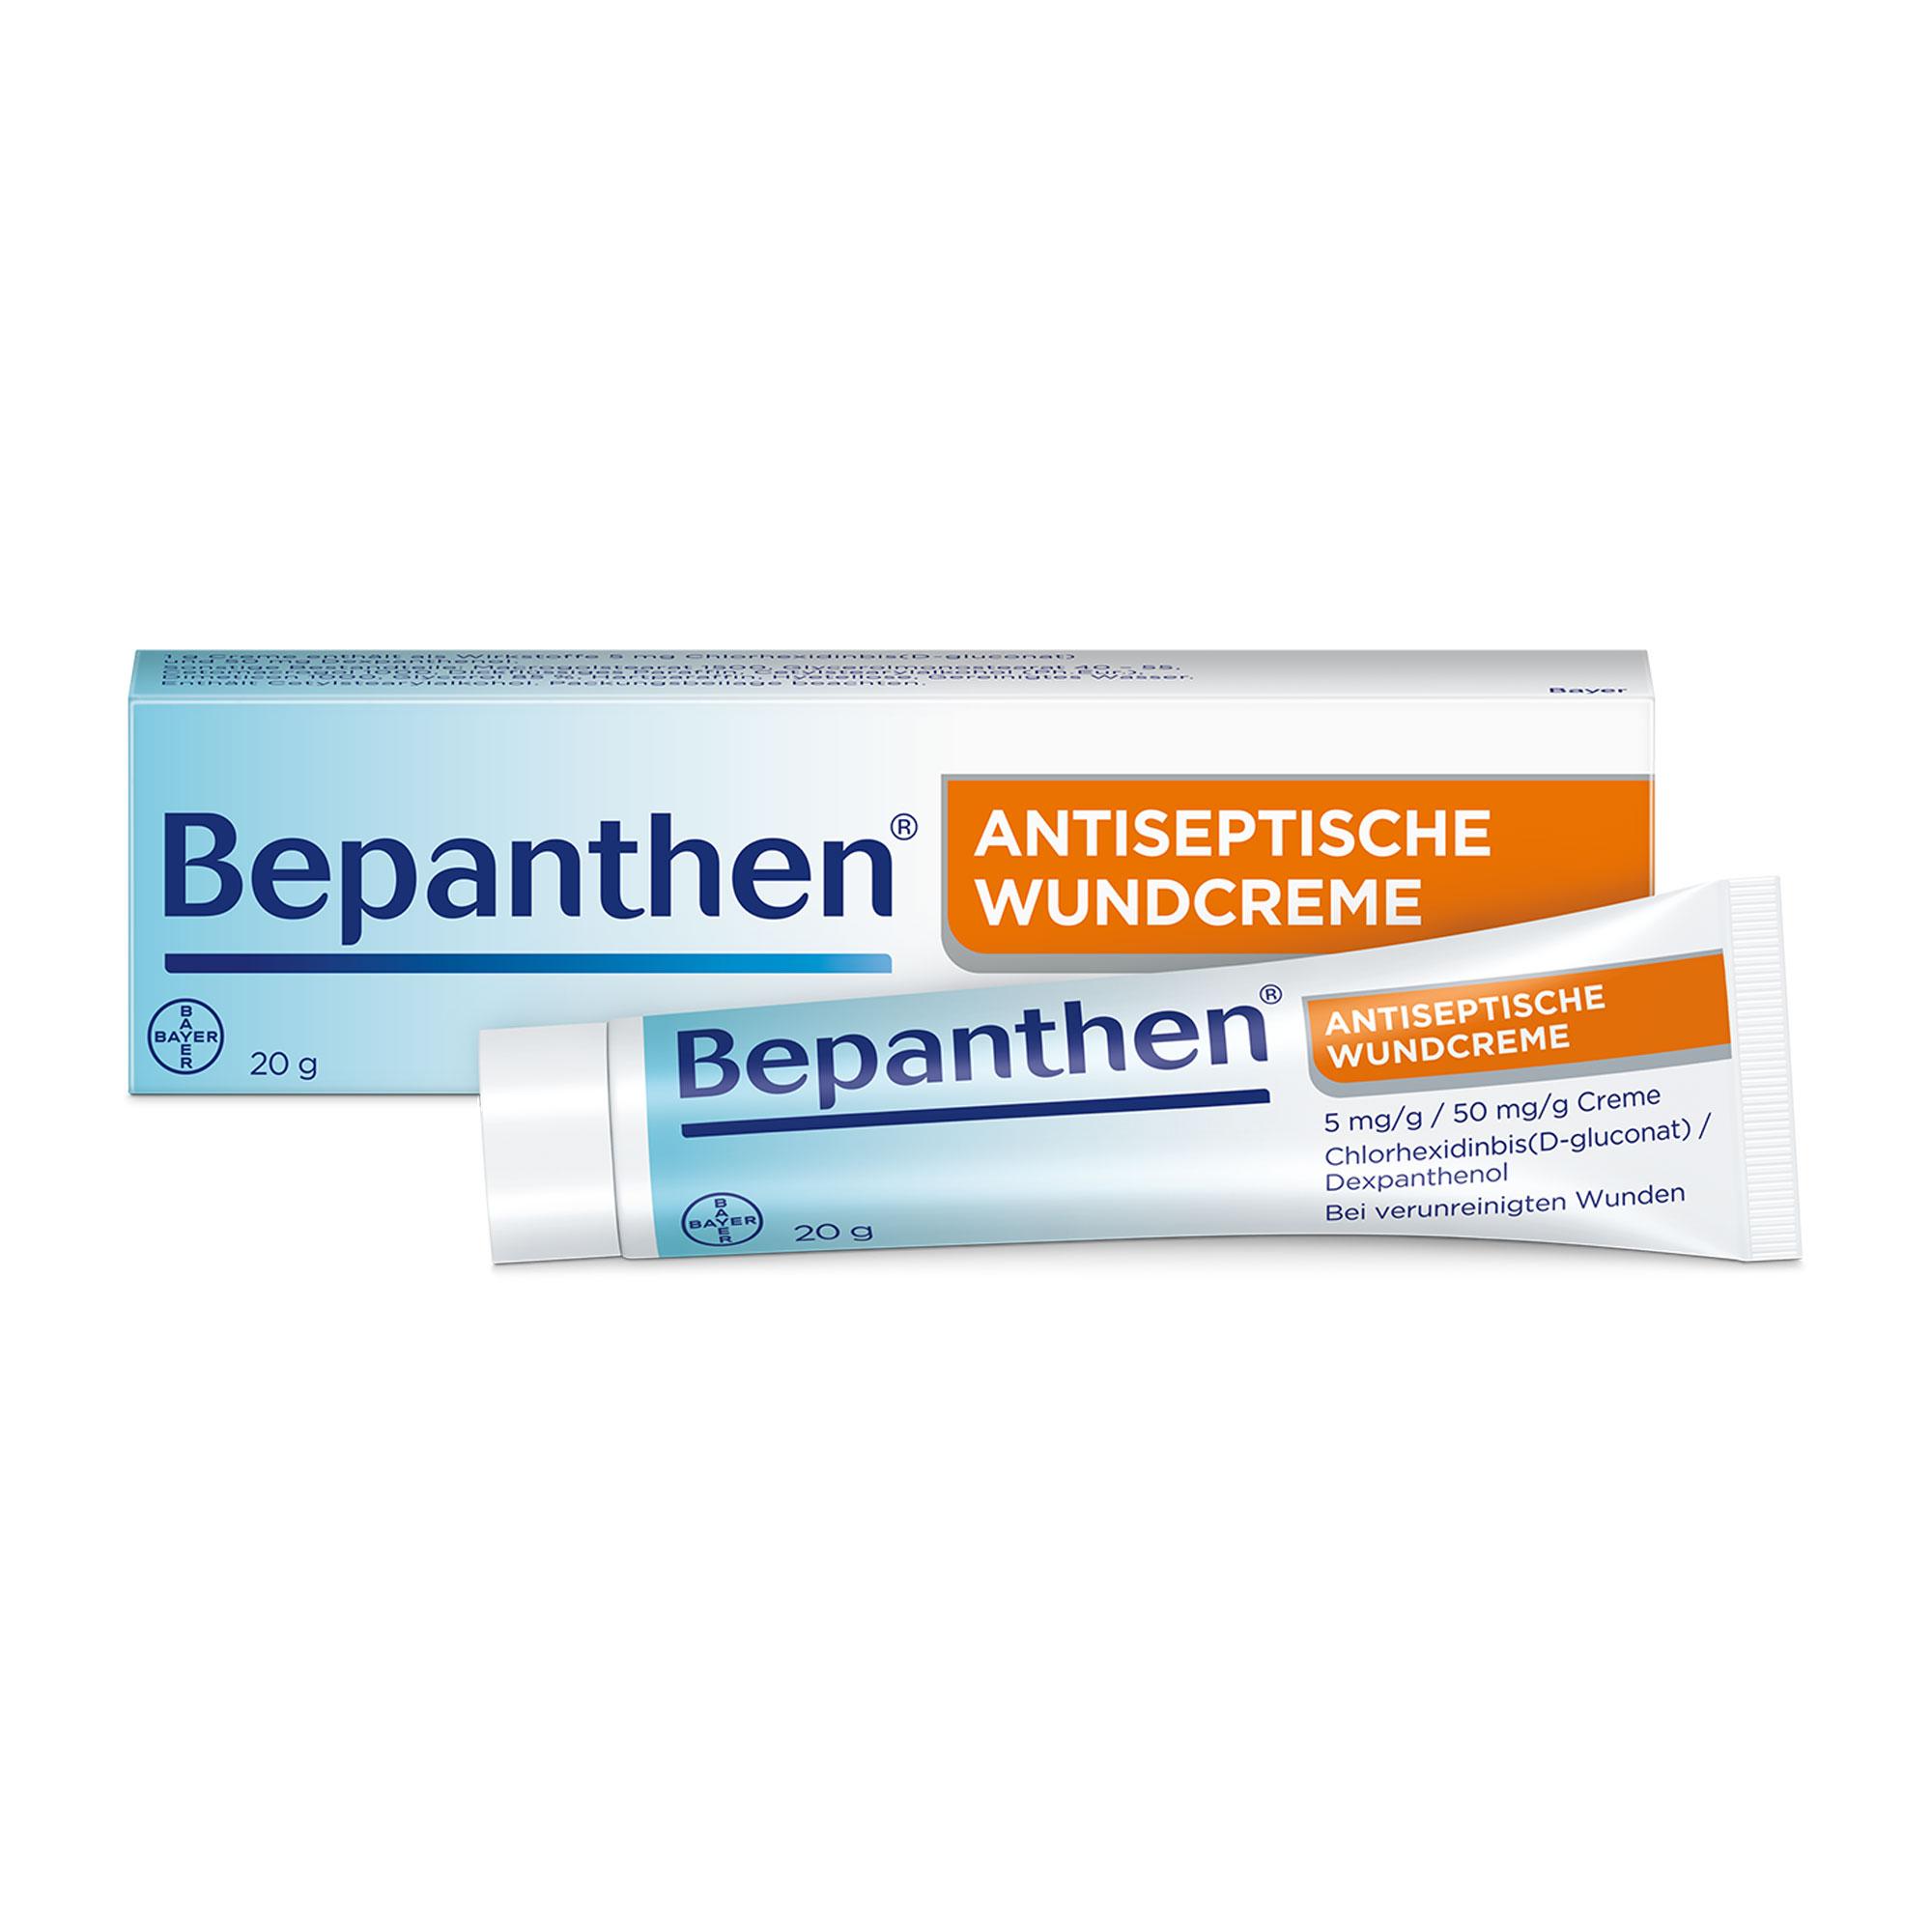 Bepanthen Antiseptische Wundcreme